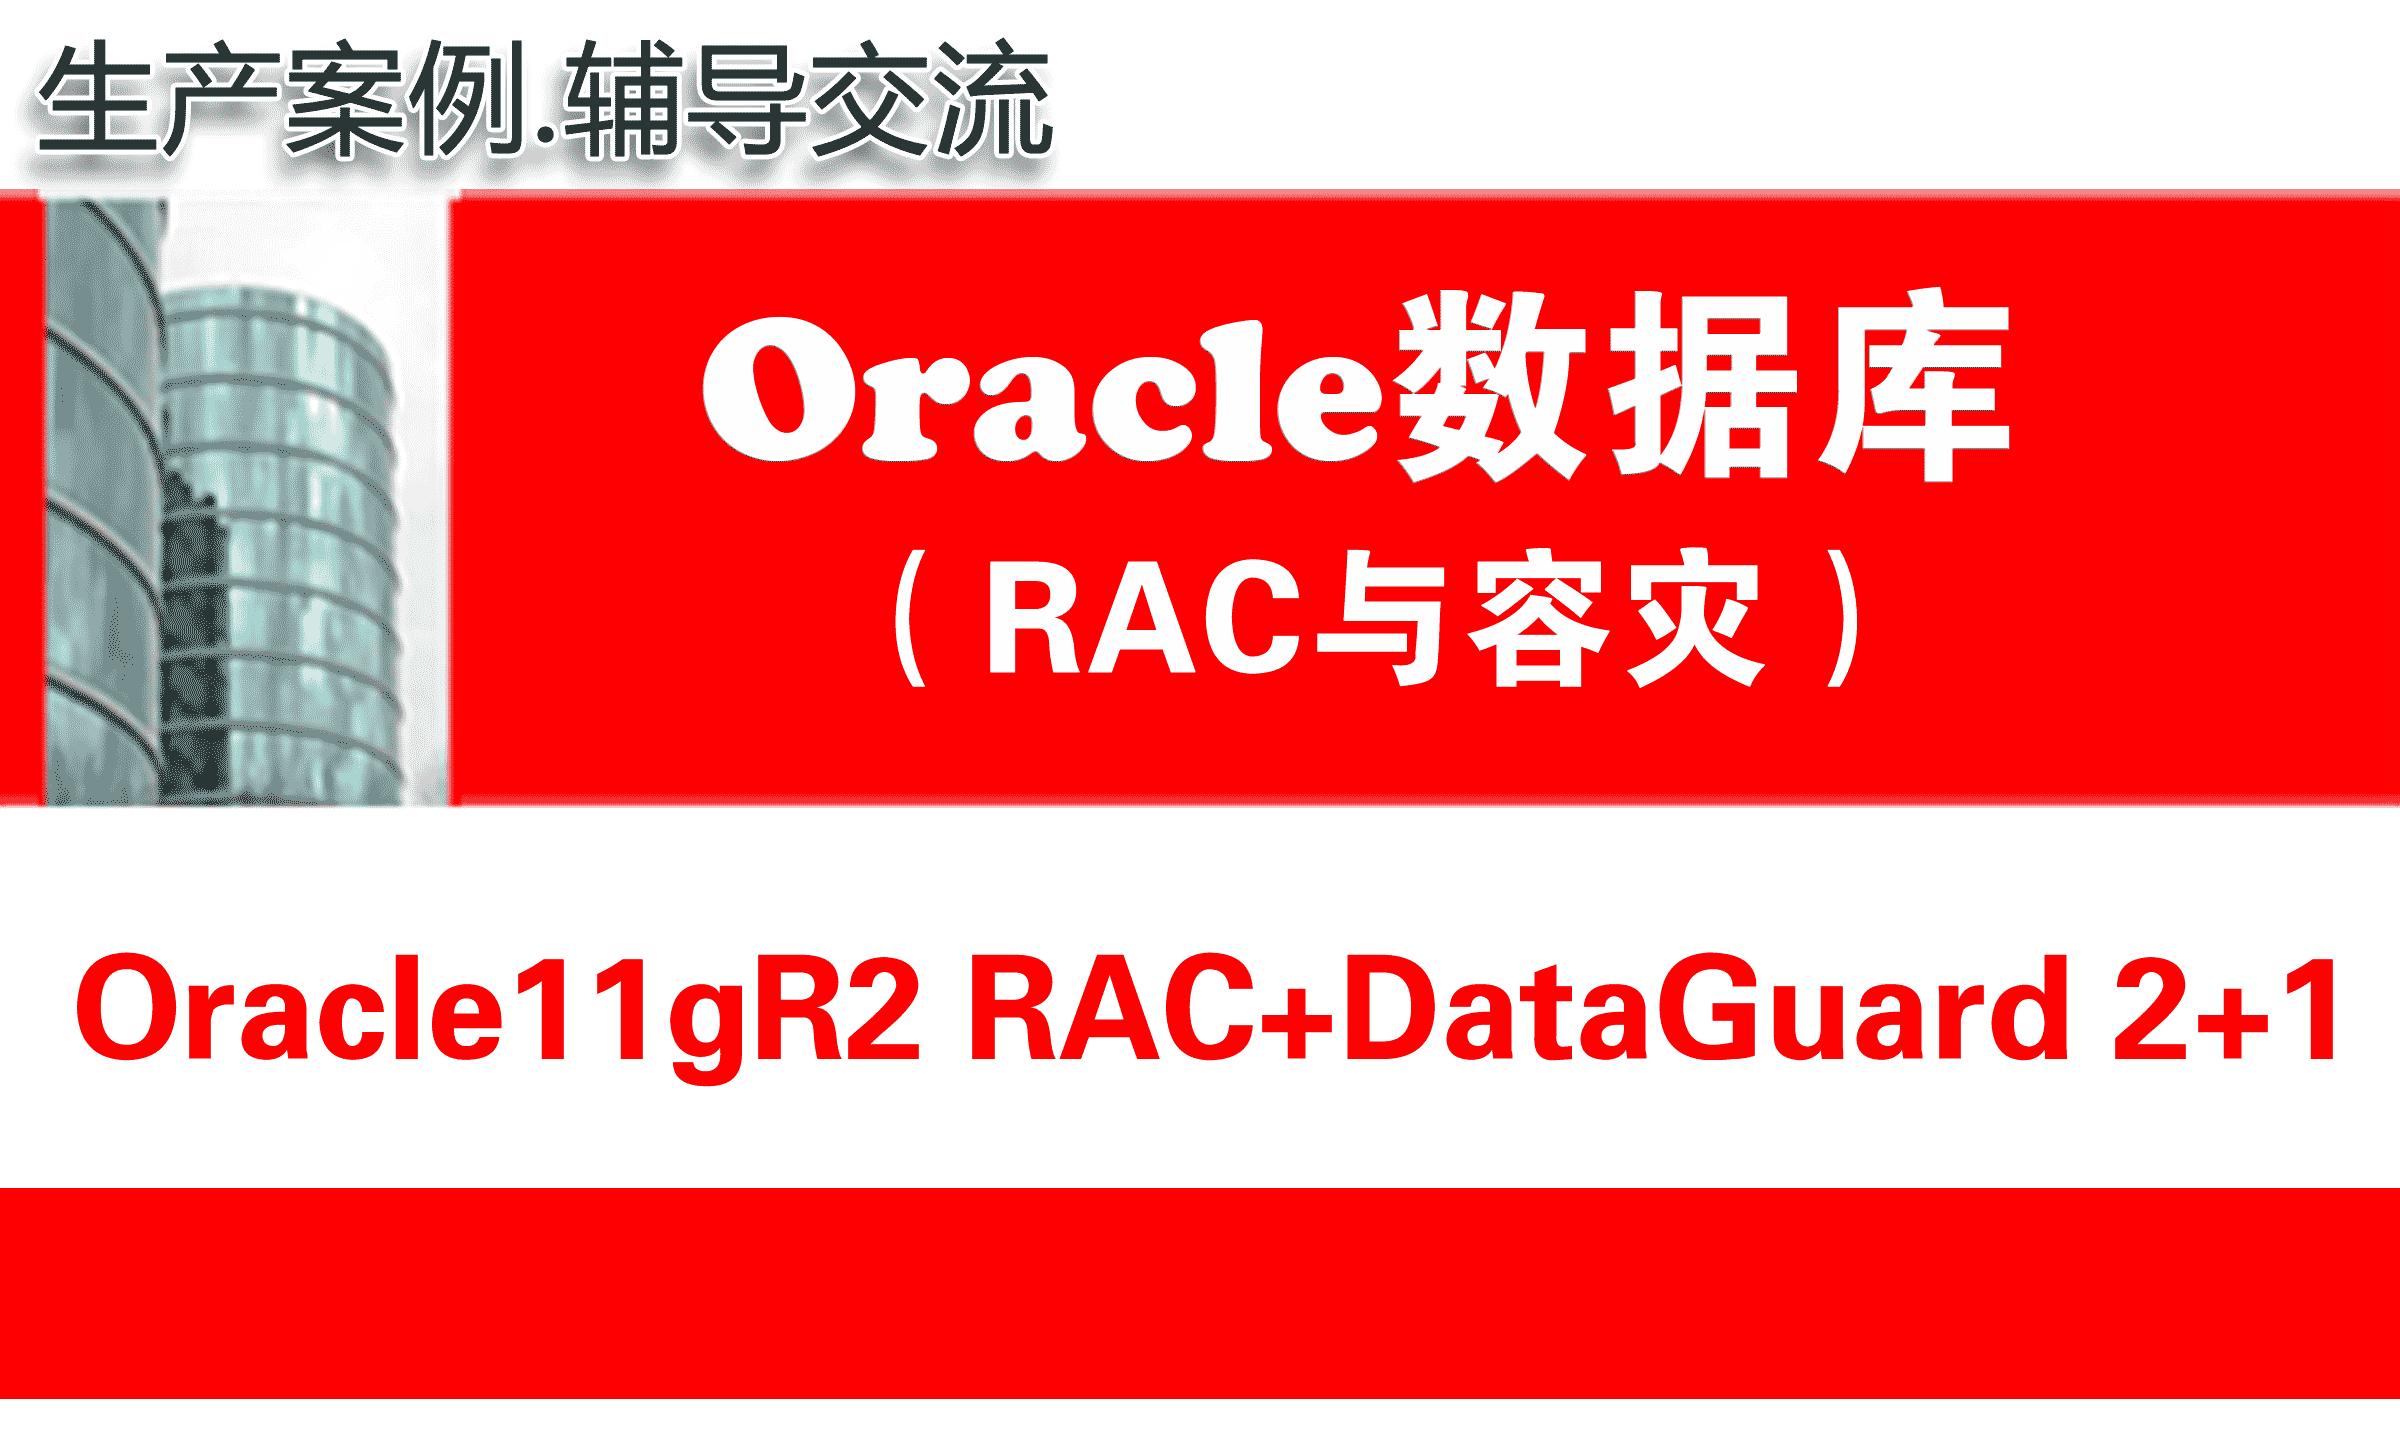 Oracle11gR2 RAC+DataGuard专题1.0